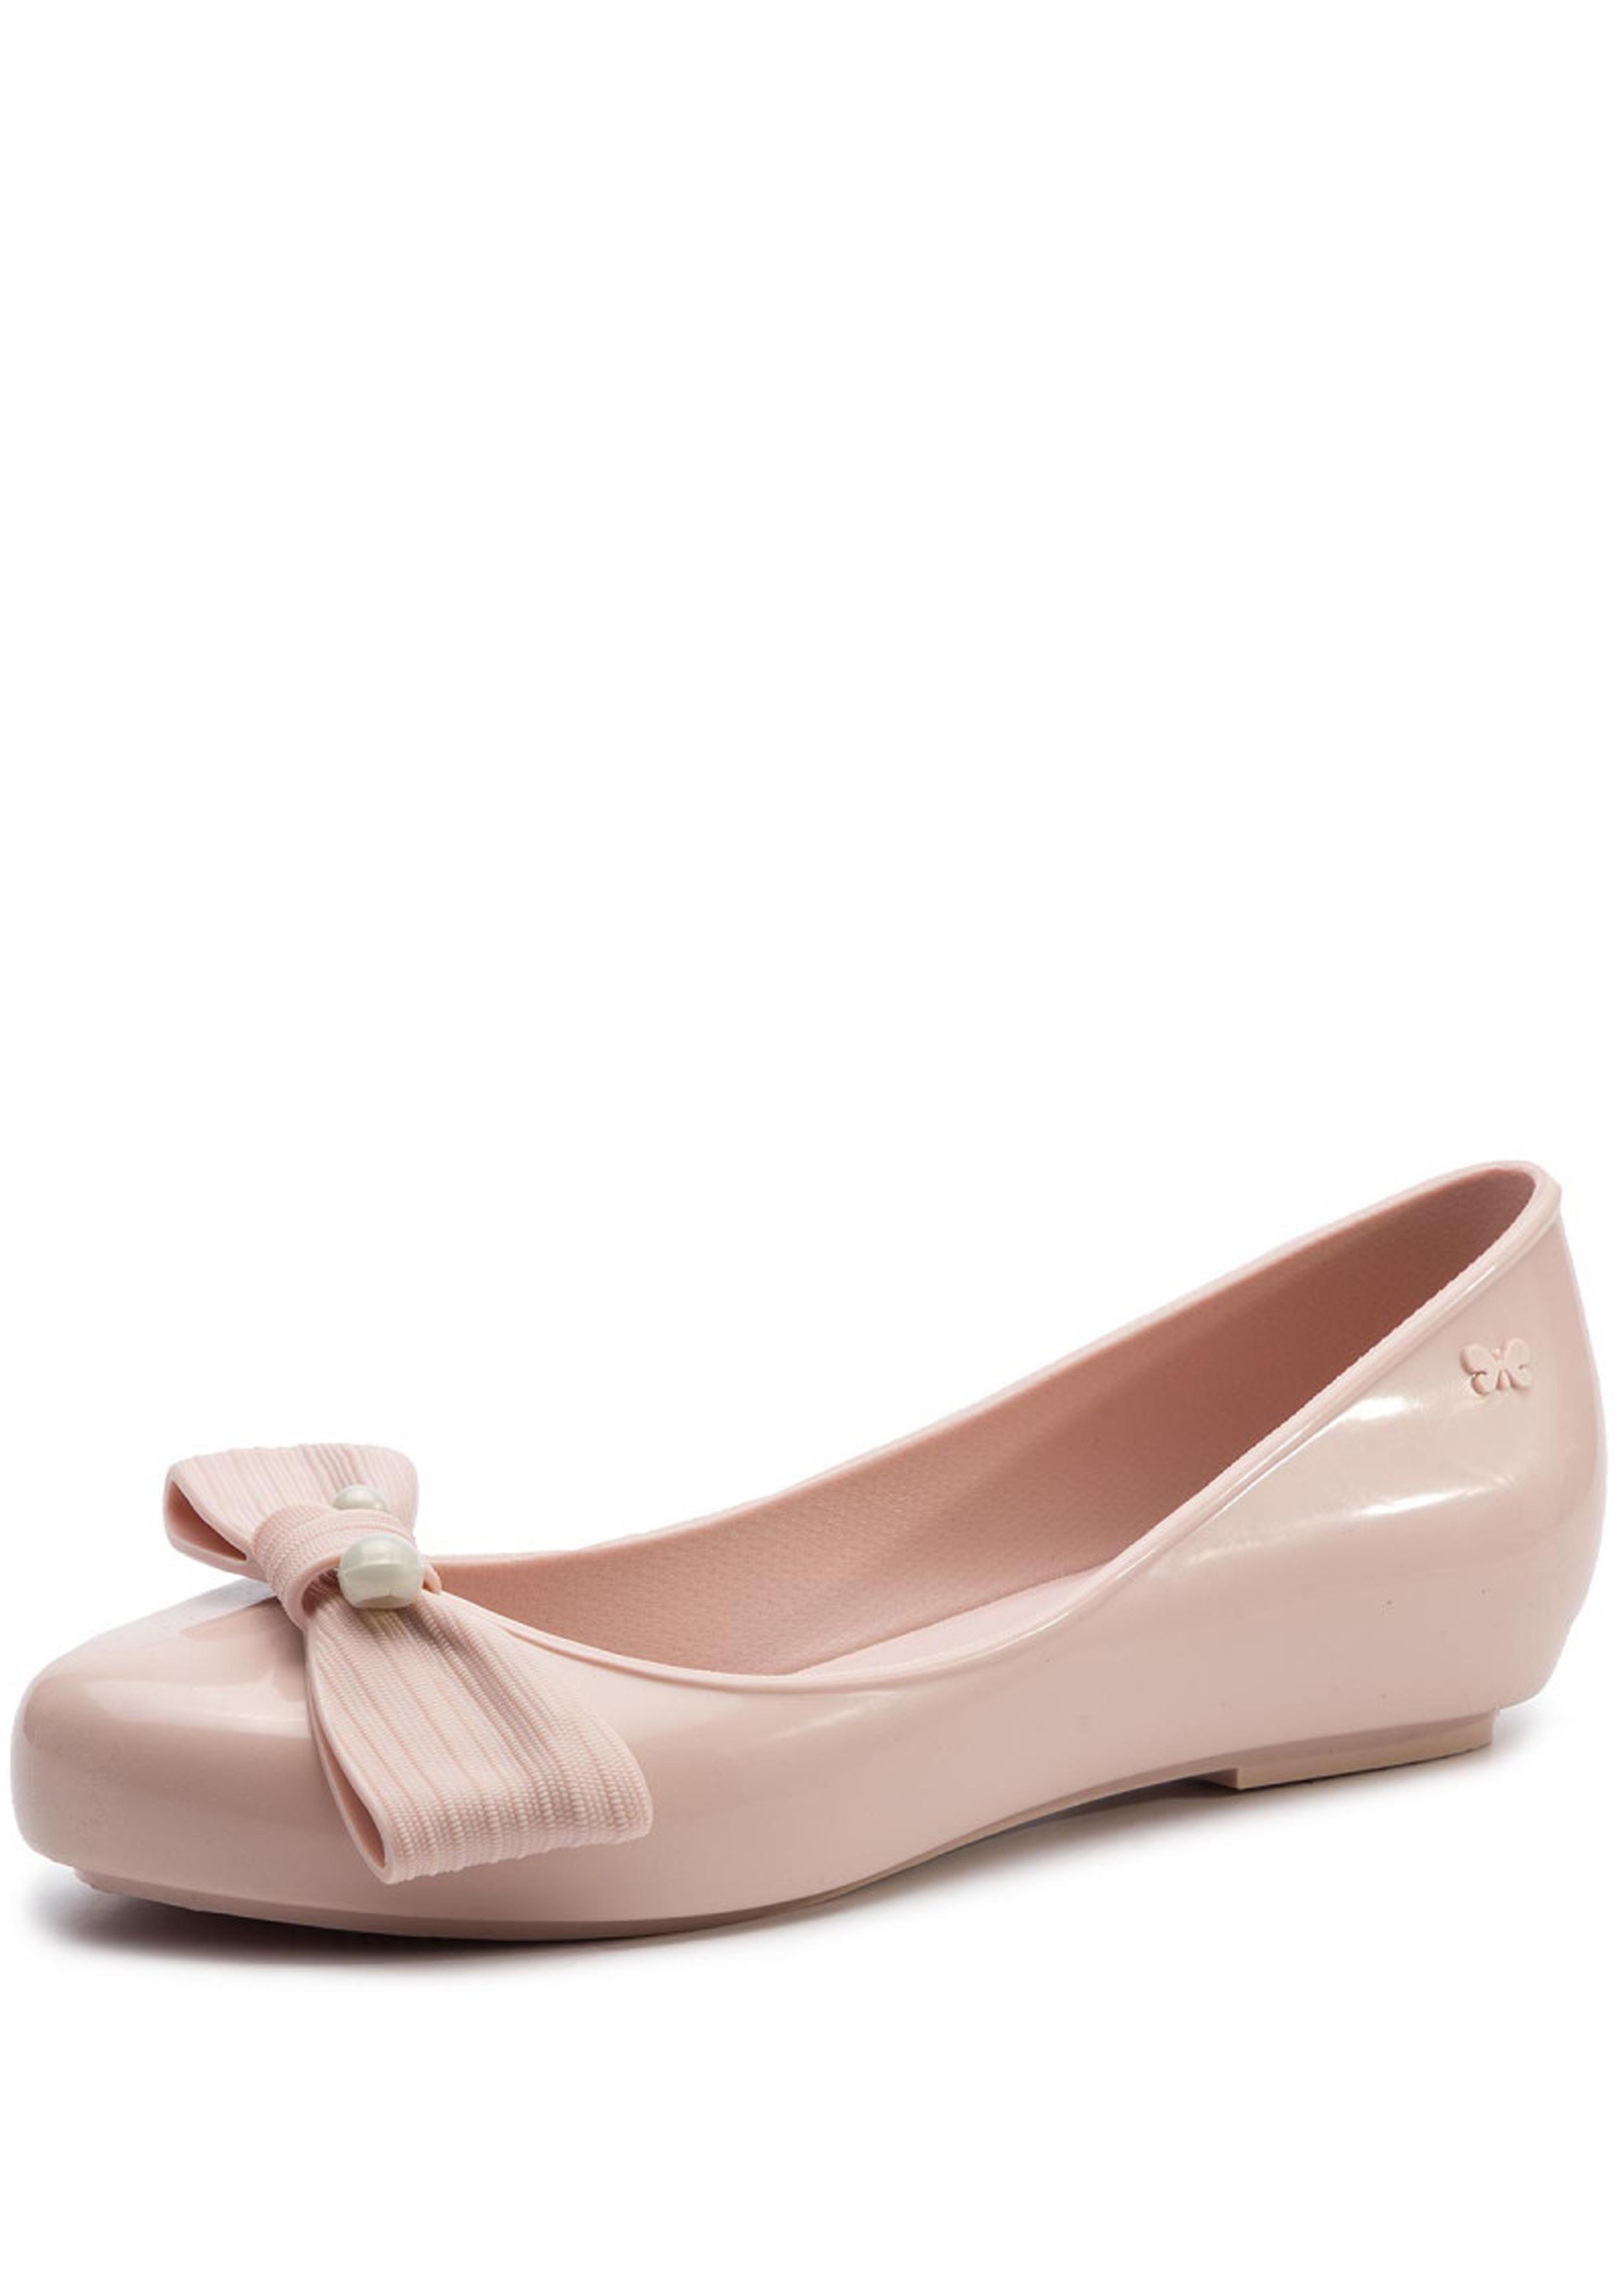 Zaxy dámské baleríny new pop charm fem 82603 růžové